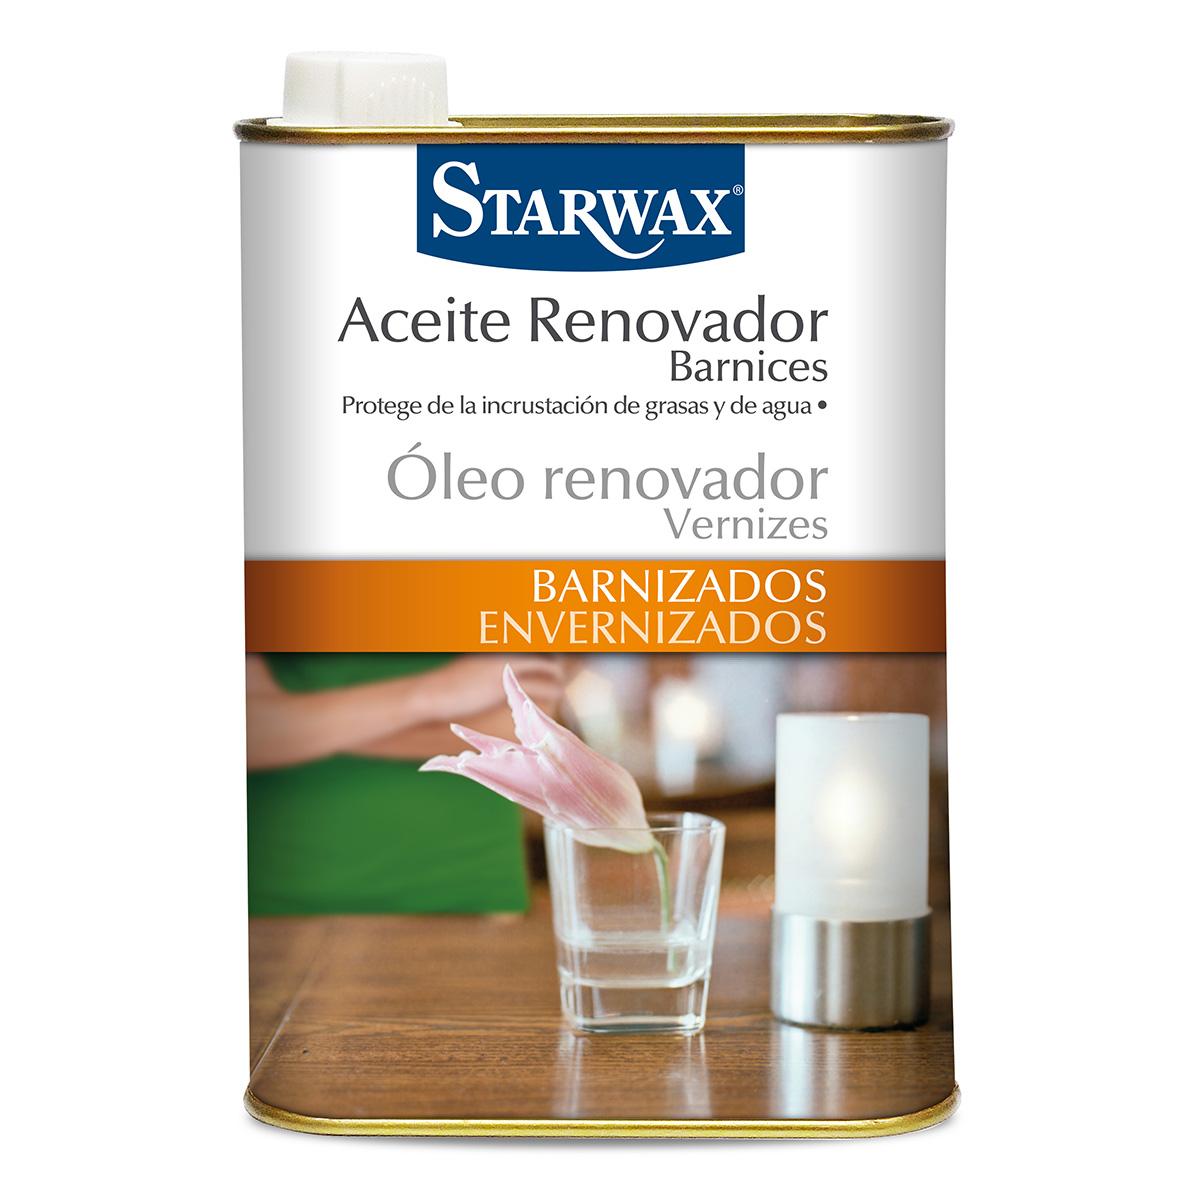 Aceite renovador barnices - Starwax